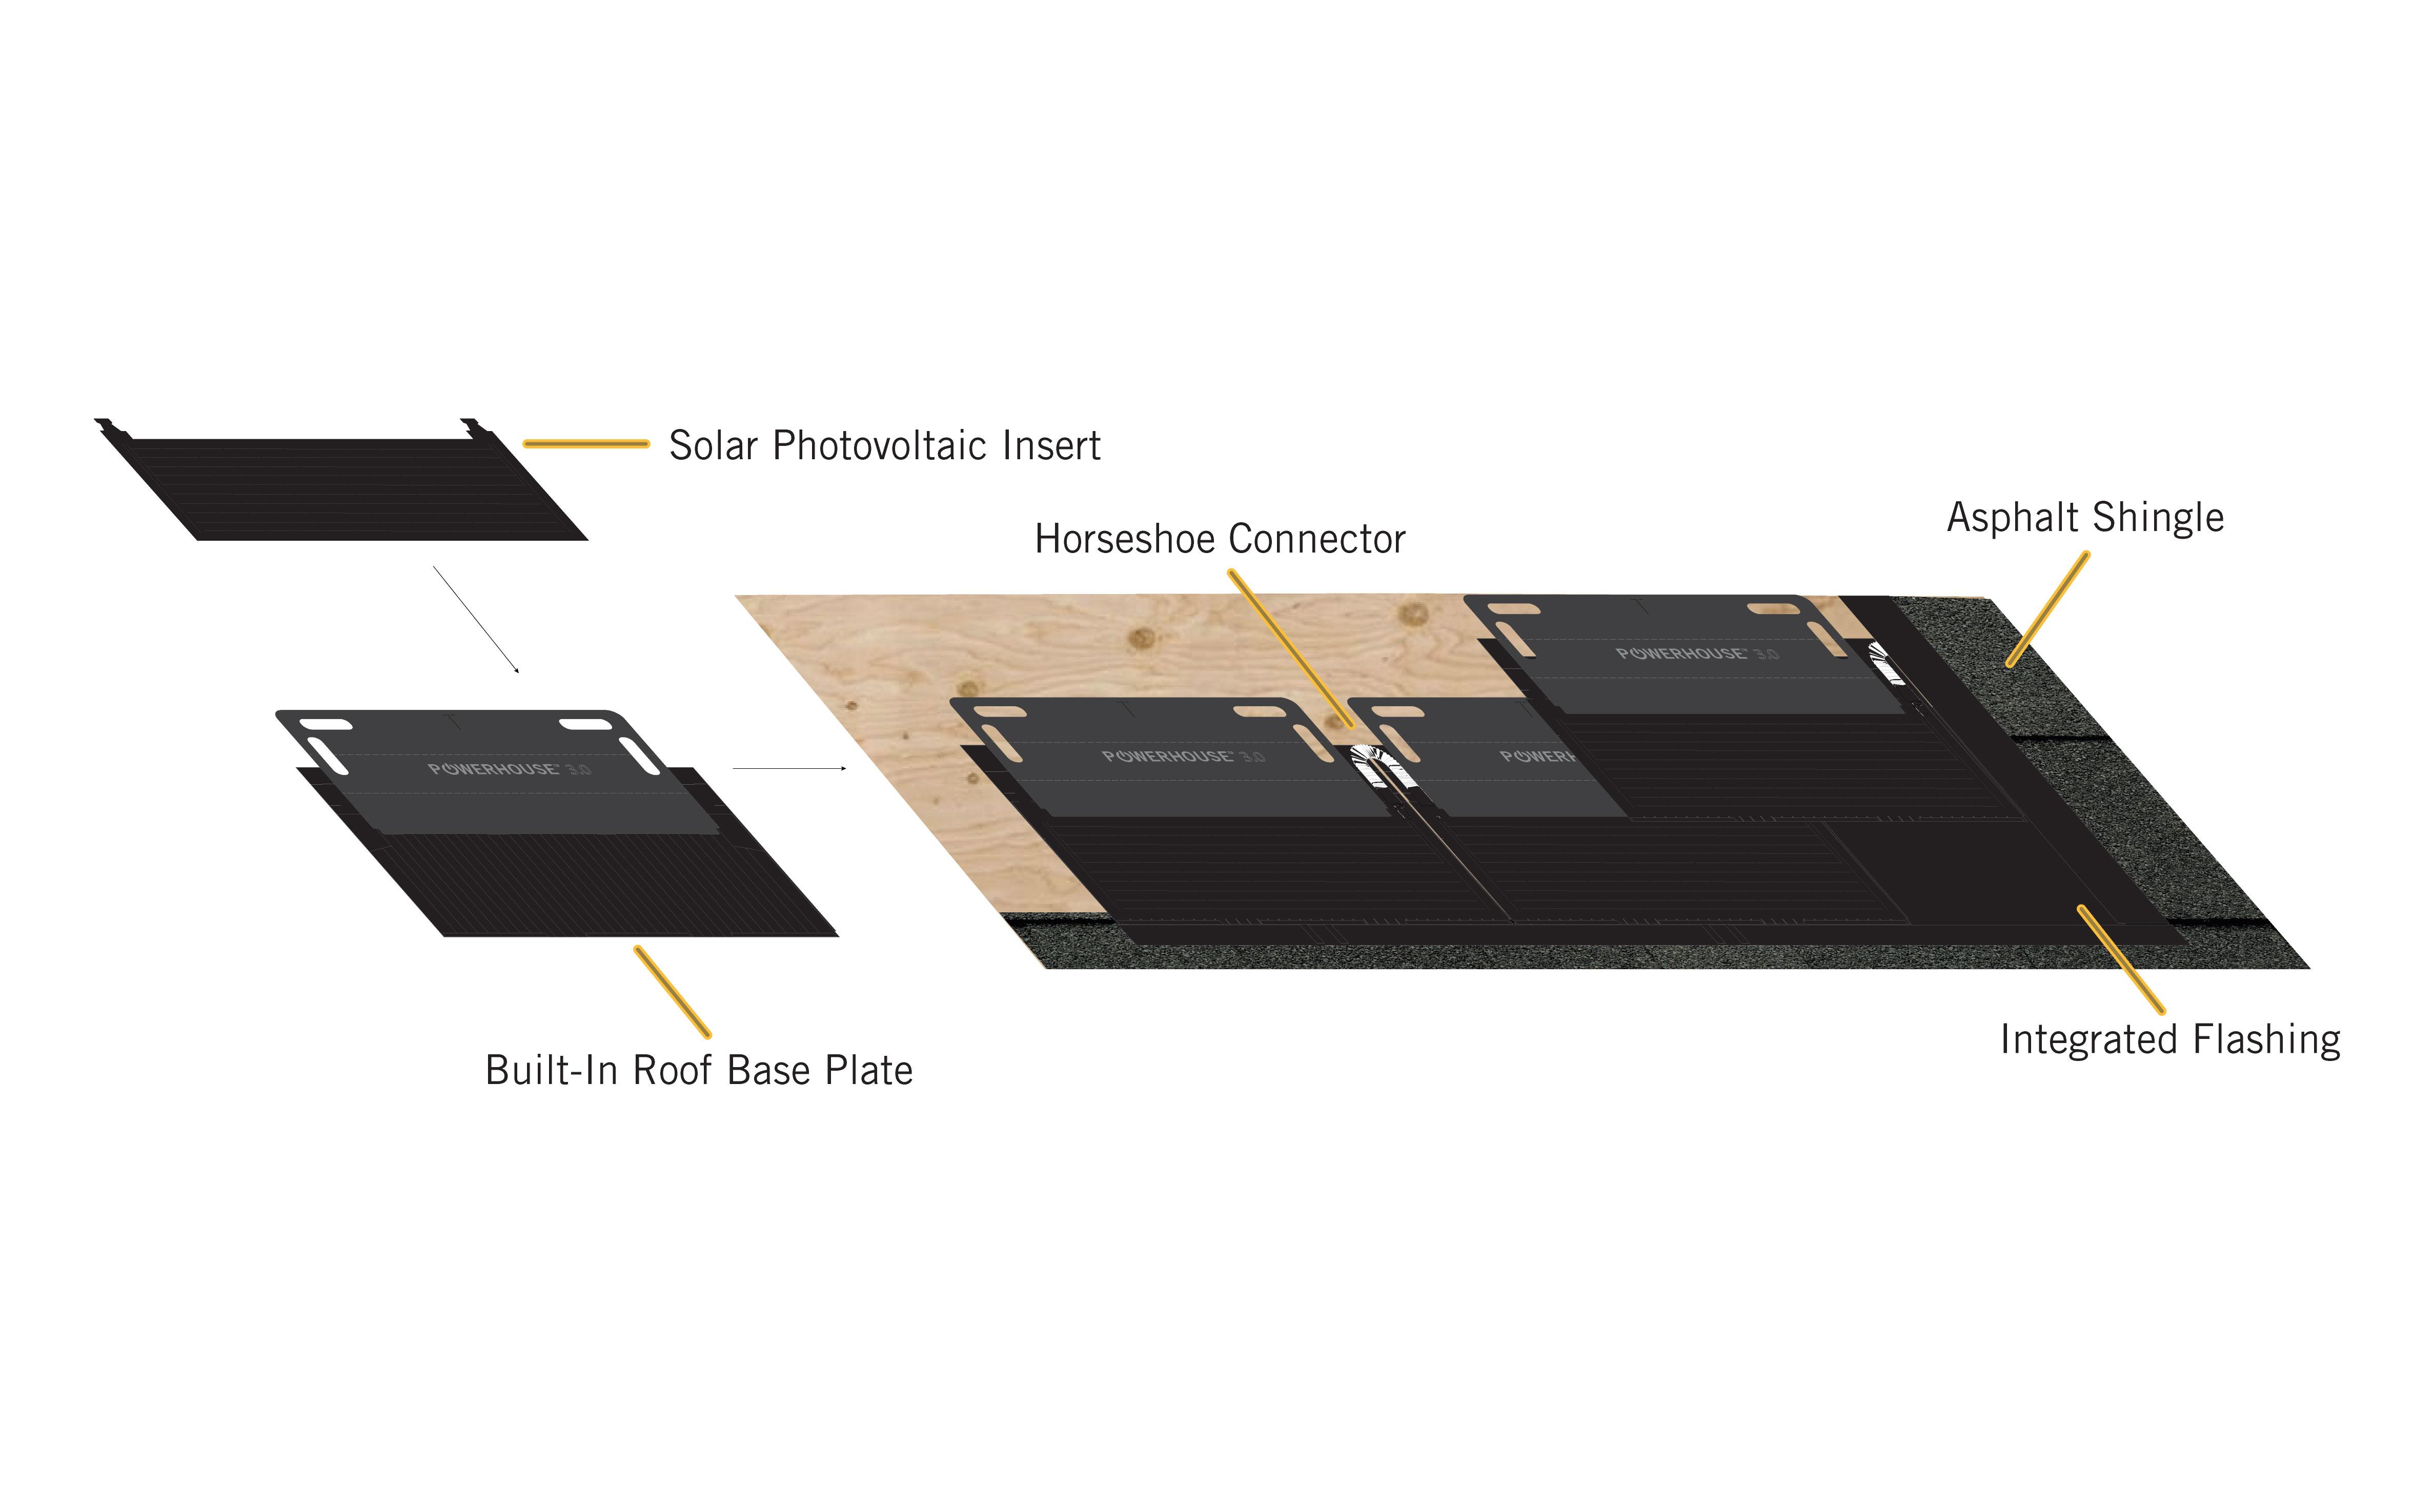 POWERHOUSE 3.0 SOLAR SHINGLE ARRAY assembly image for illustrative purposes